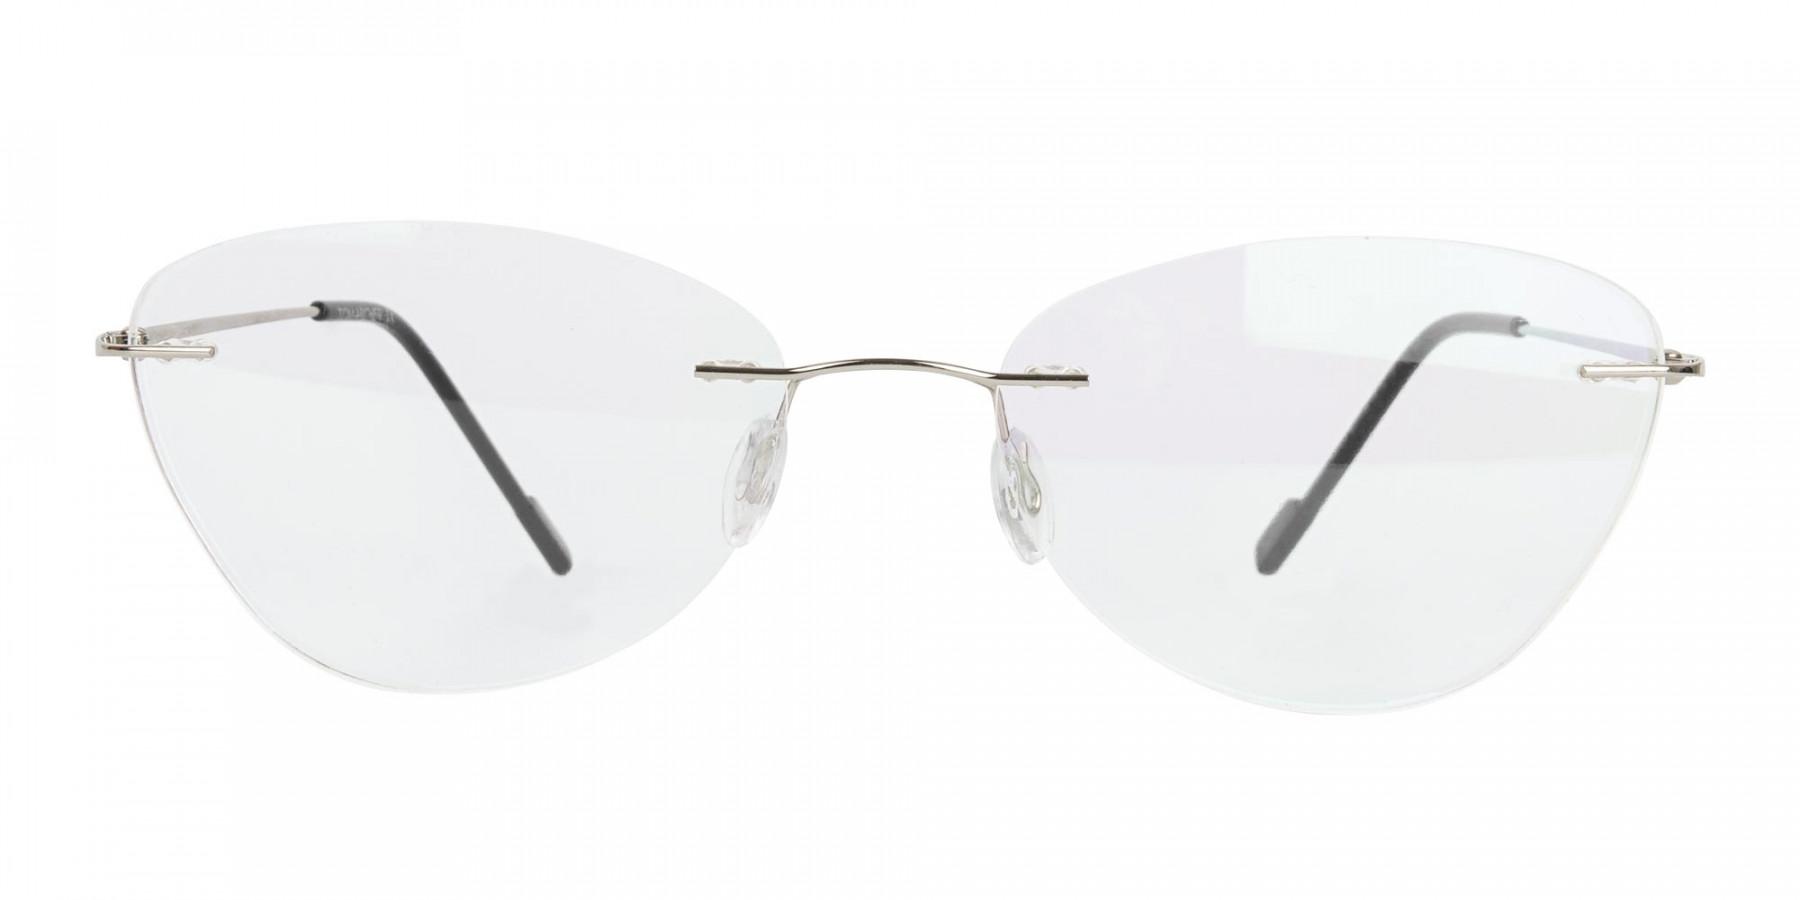 Rimless Cat-Eye Glasses in Silver Metal-1